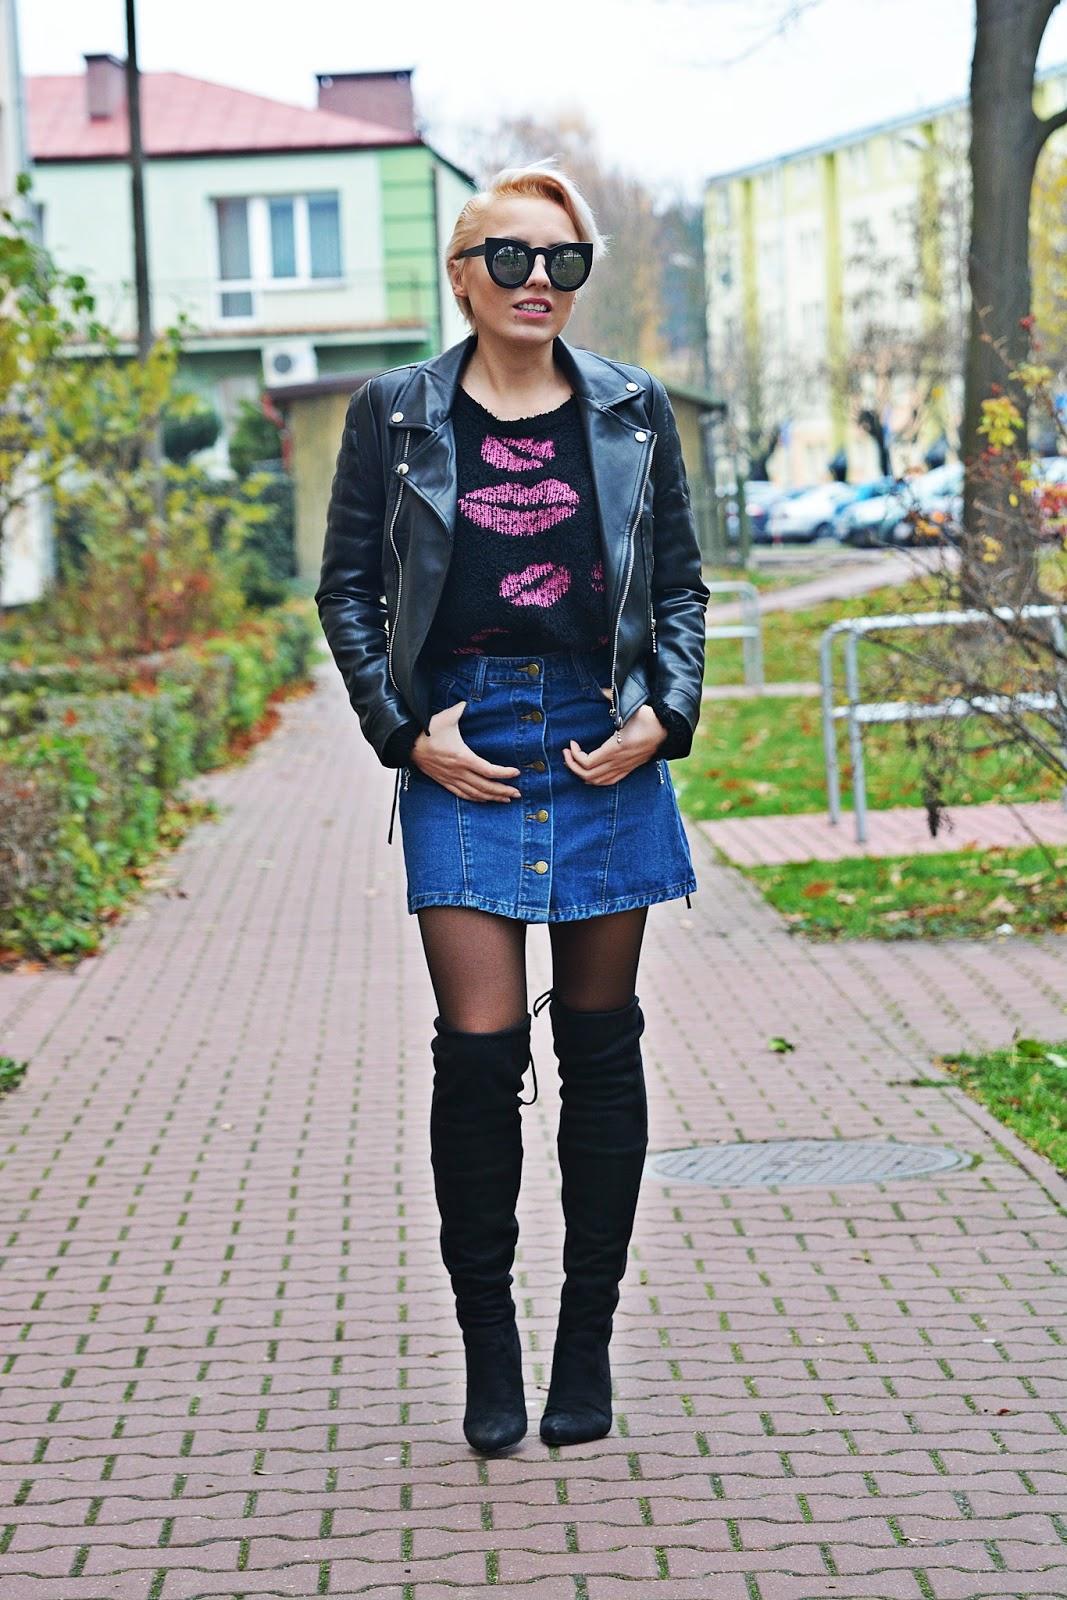 jeansowa_spodnica_skorzana_ramoneska_buty_za_kolano_karyn